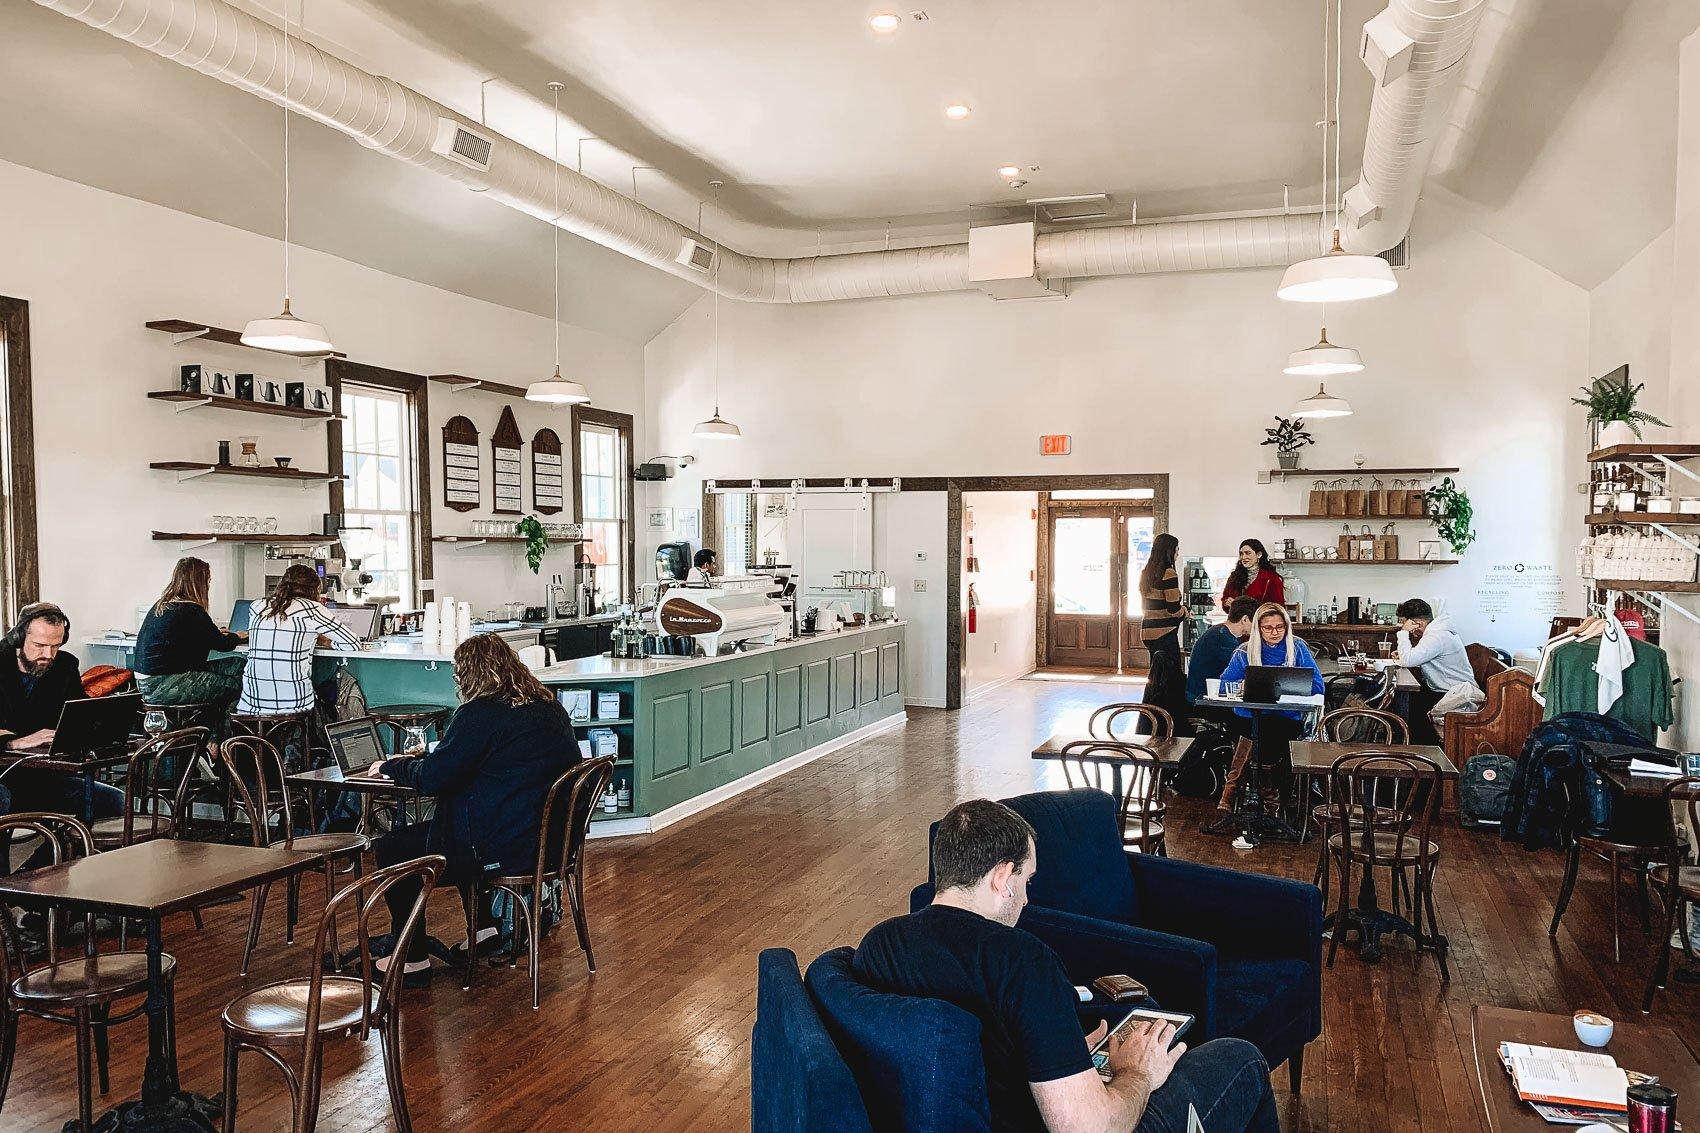 Interior of Humphreys Coffee Shop in Nashville Tennessee - bucket list travel